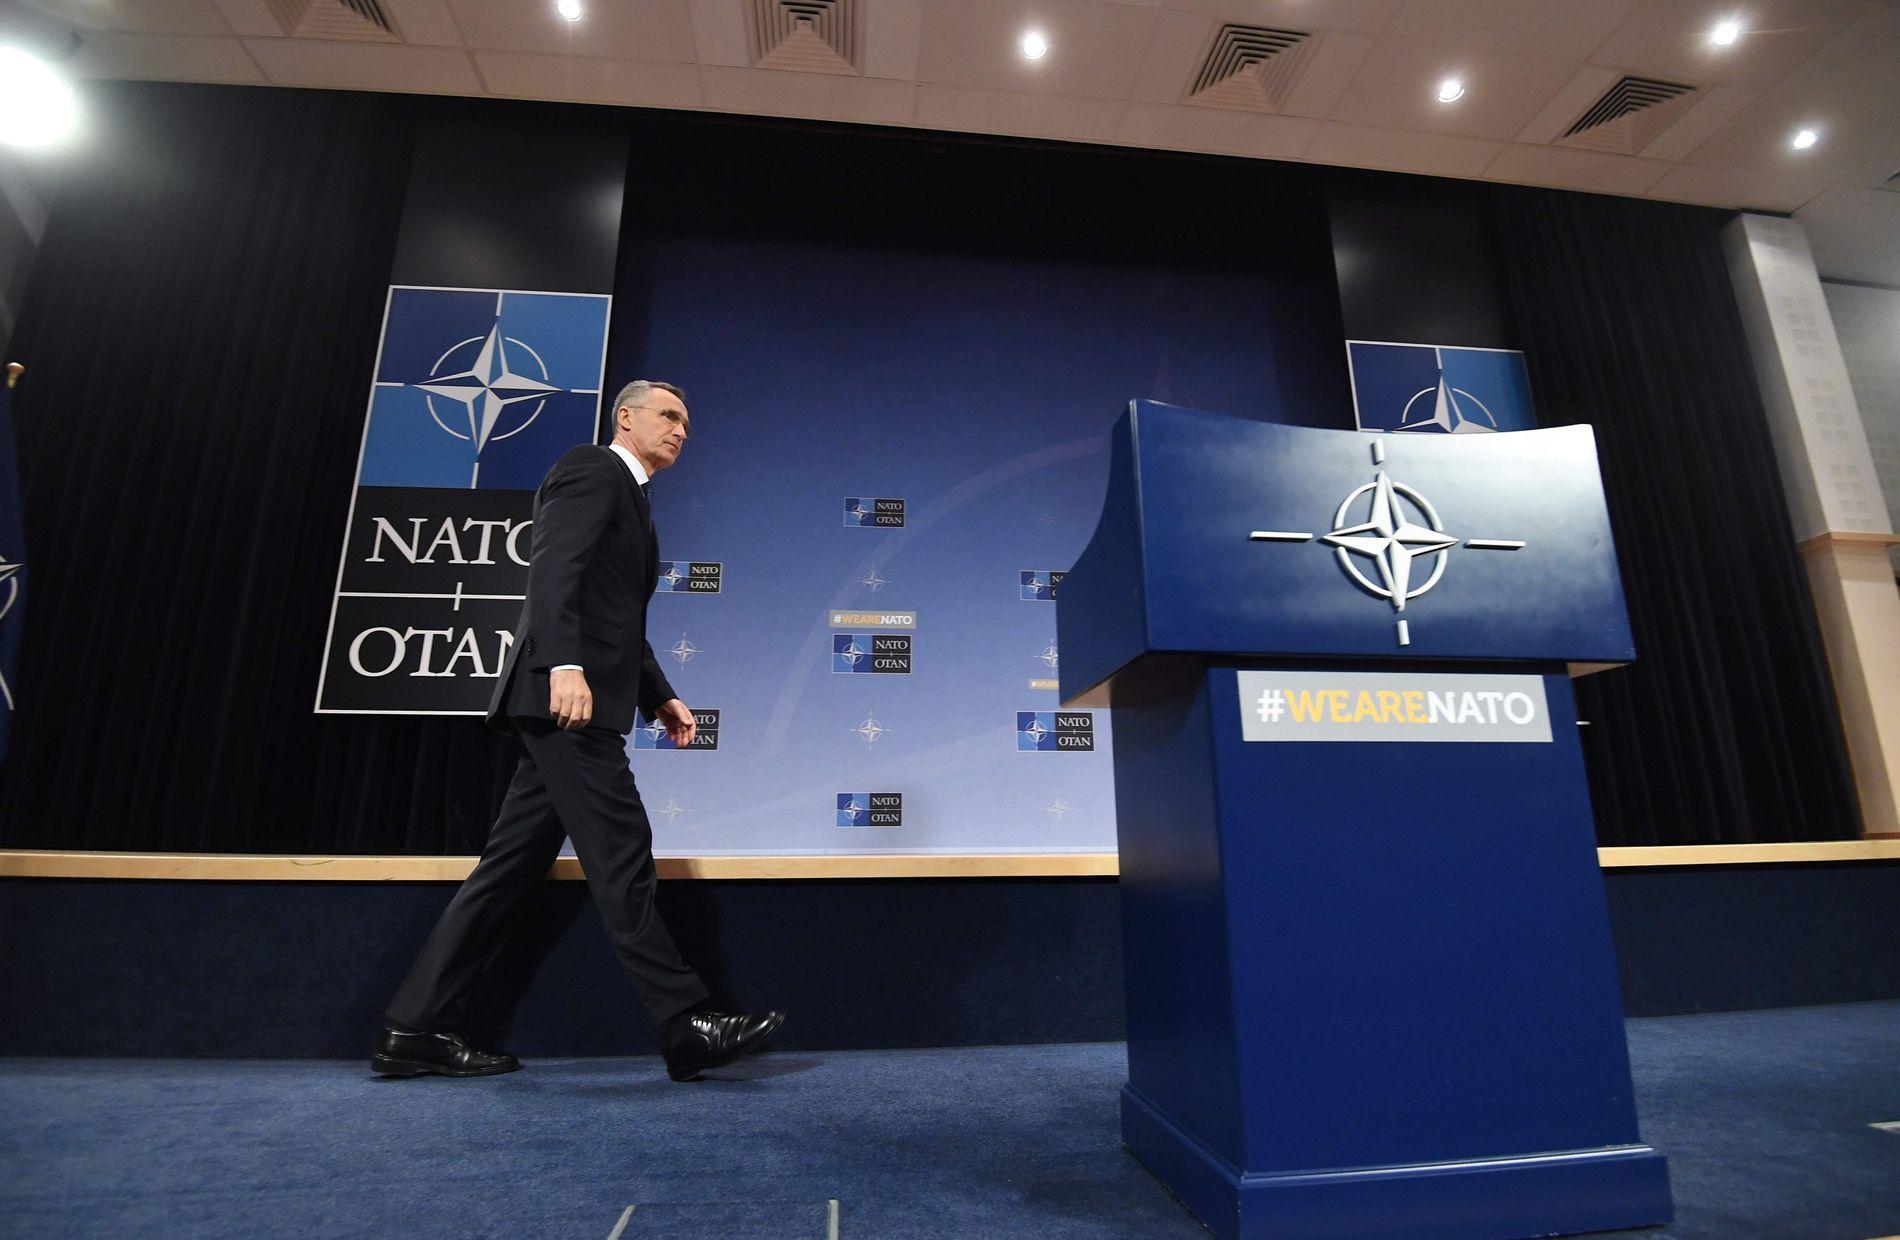 REAGERER: Jens Stoltenberg, som er generalsekretær i NATO, la torsdag fram alliansens årsberetning i Brussel.